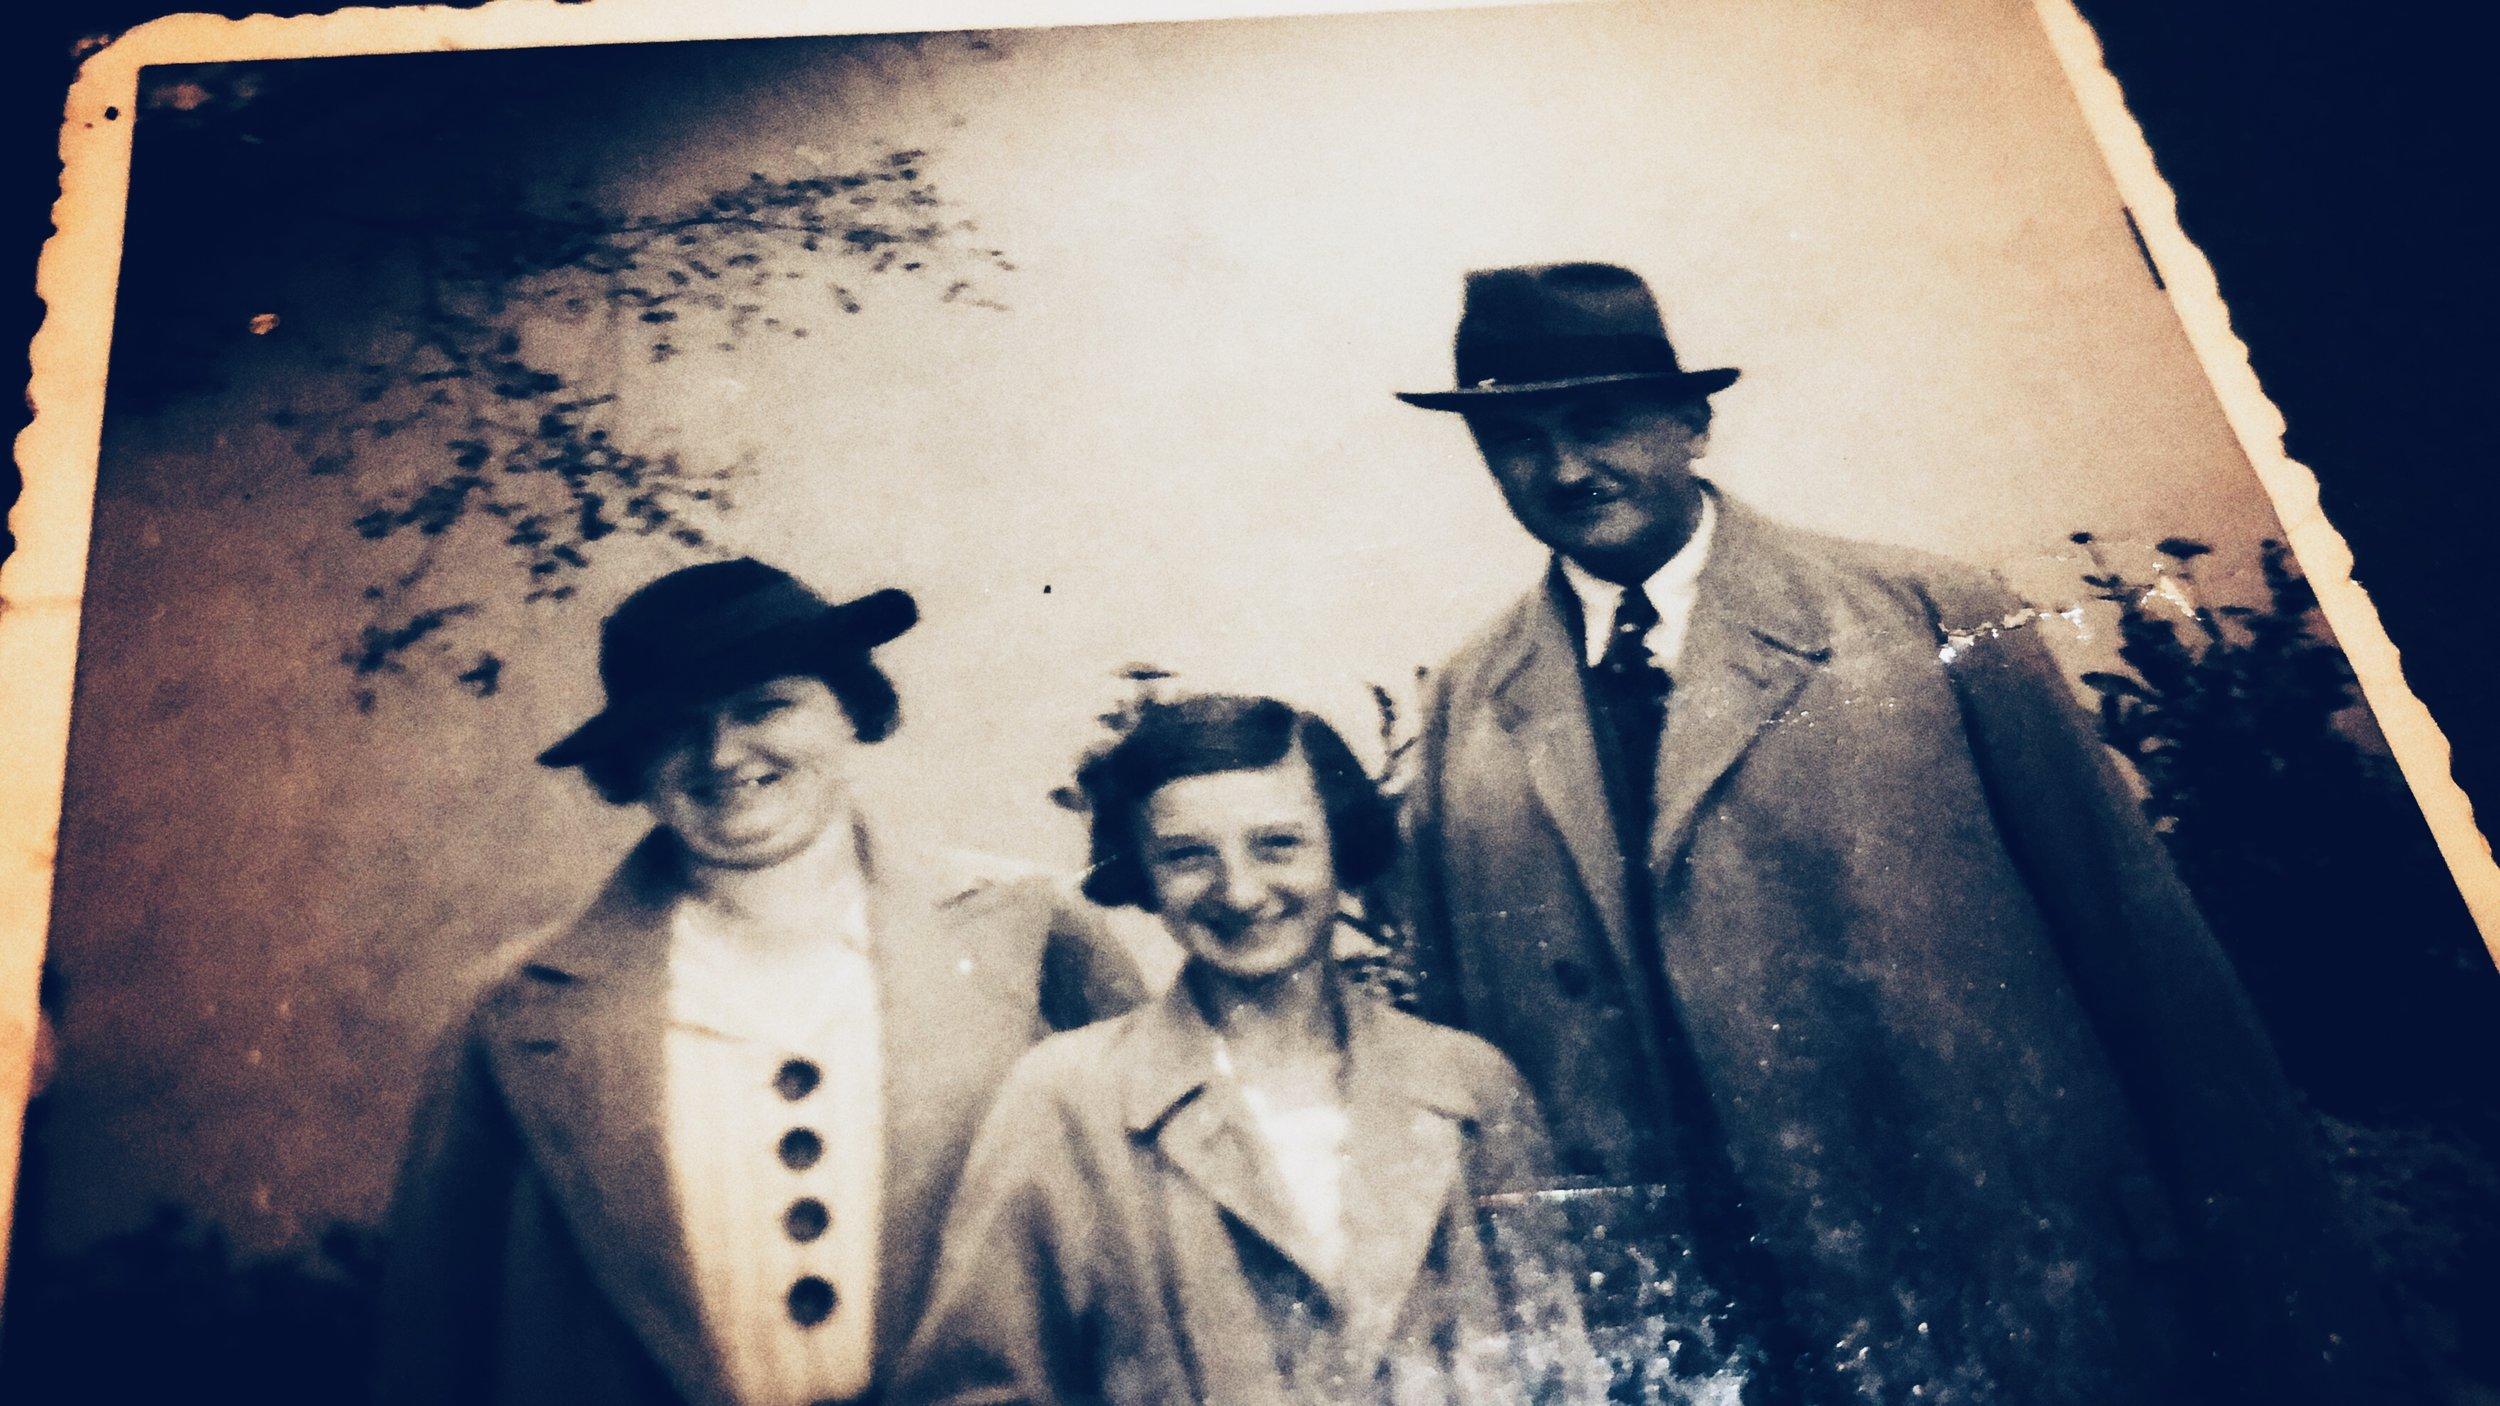 mother, miloslava, father (murdered)